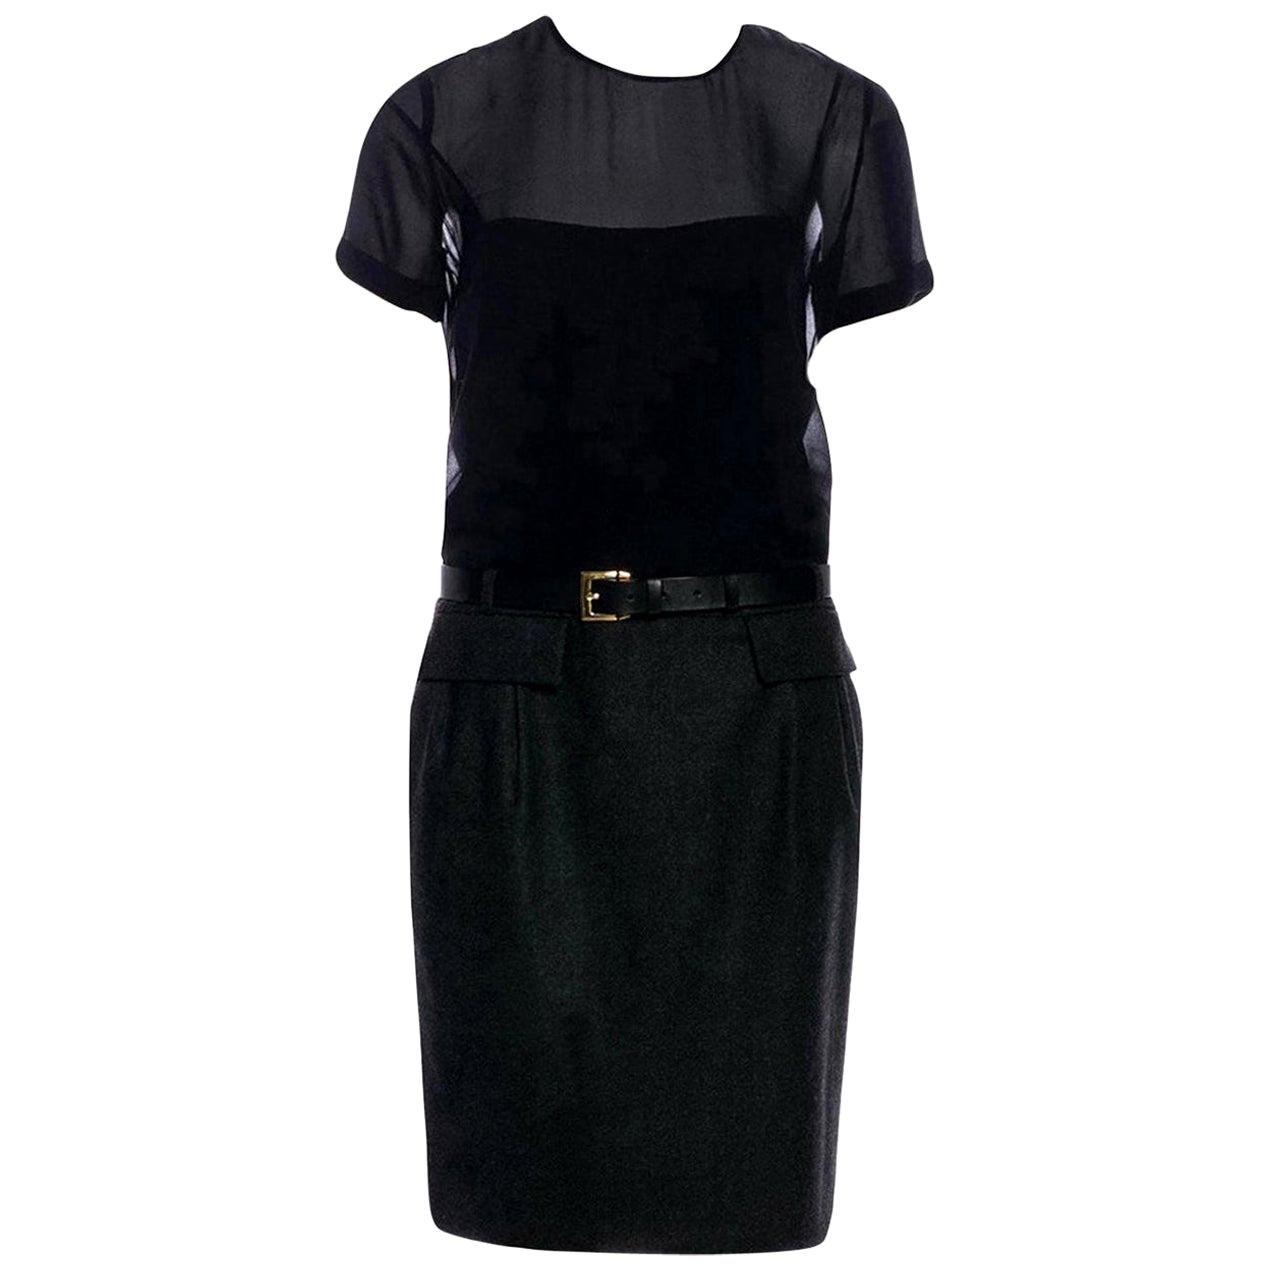 New Gucci Wool & Cashmere Dress 90th Anniversary Pre-Fall 2011